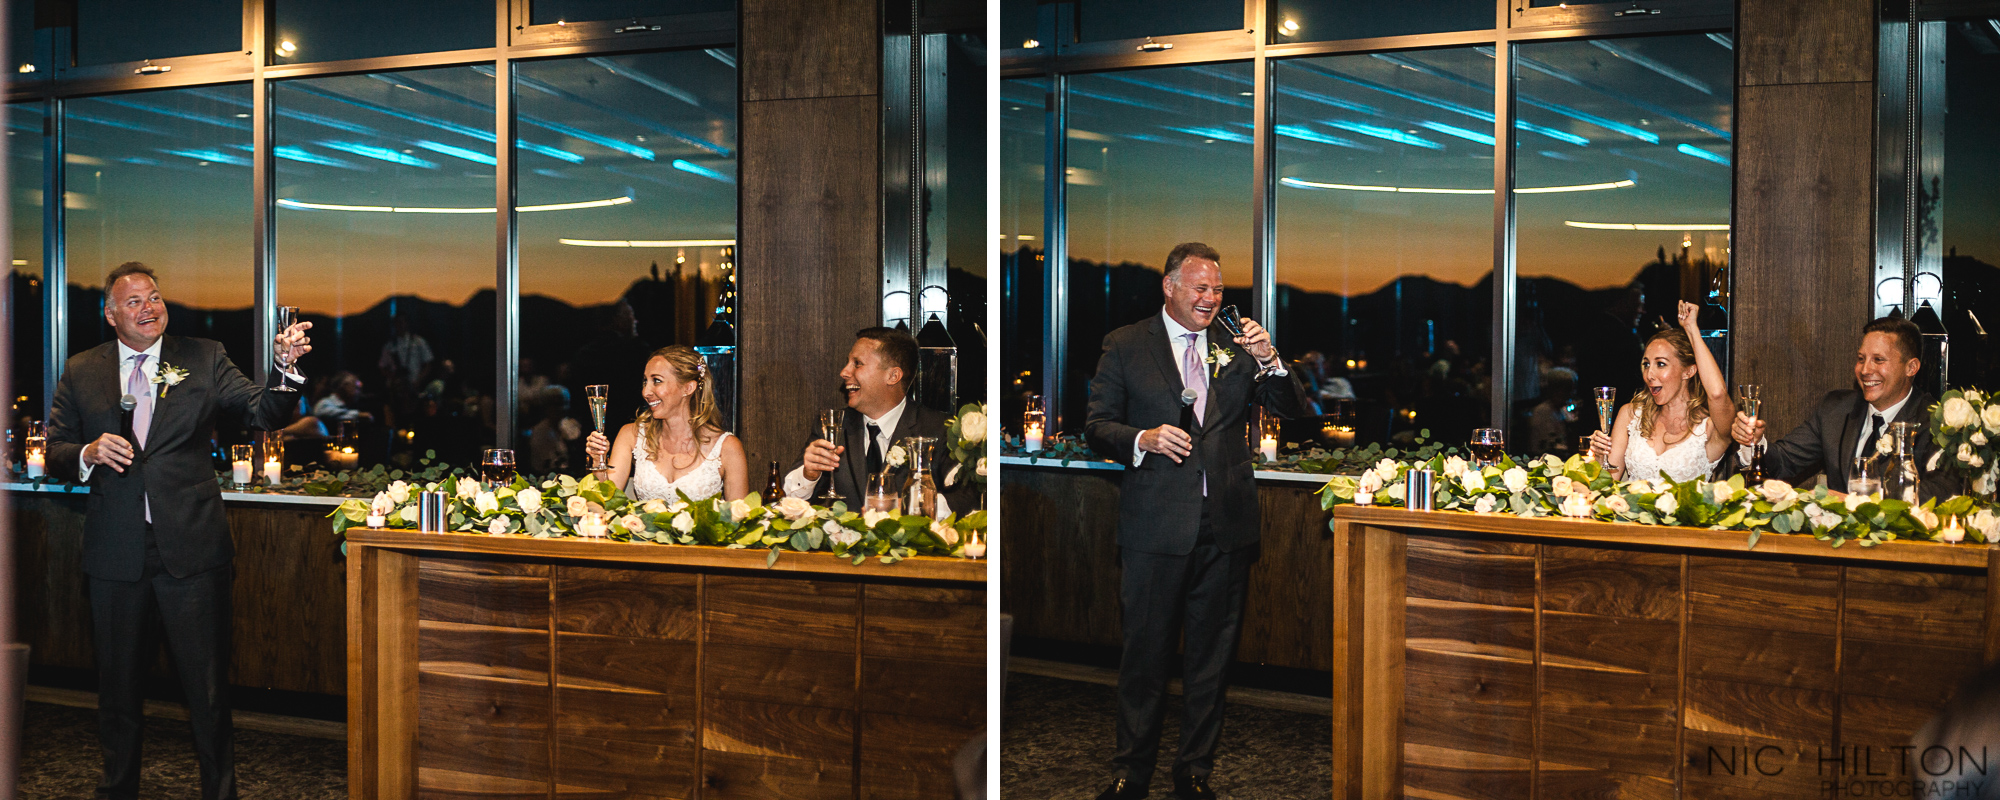 Paralax-Wedding-Reception-Toasts.jpg